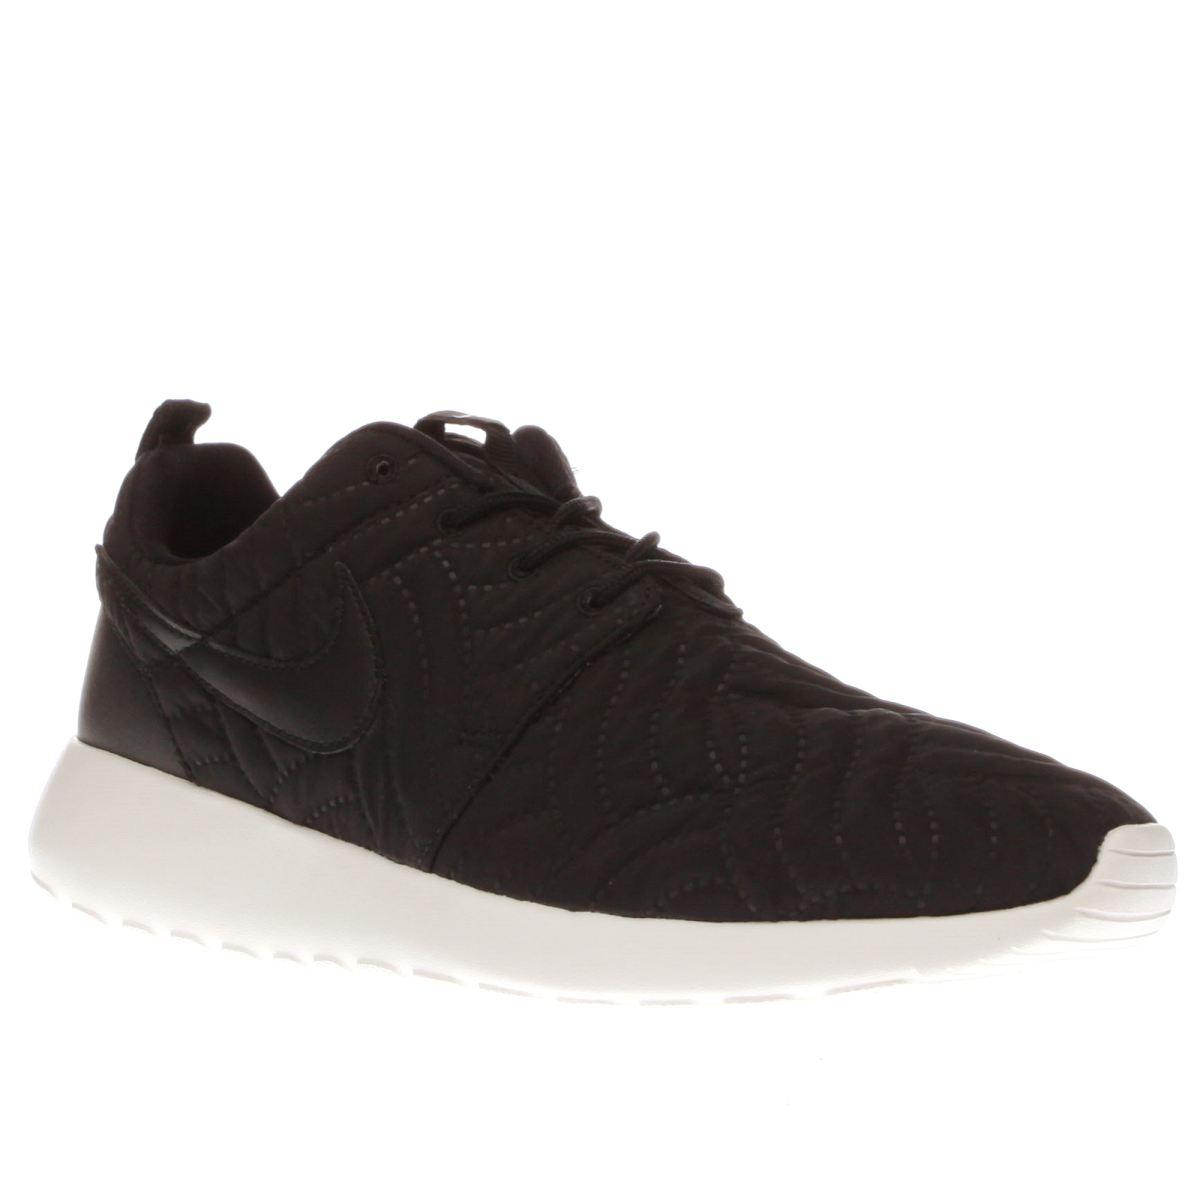 llcyd Womens Black & White Nike Roshe One Premium Trainers | schuh